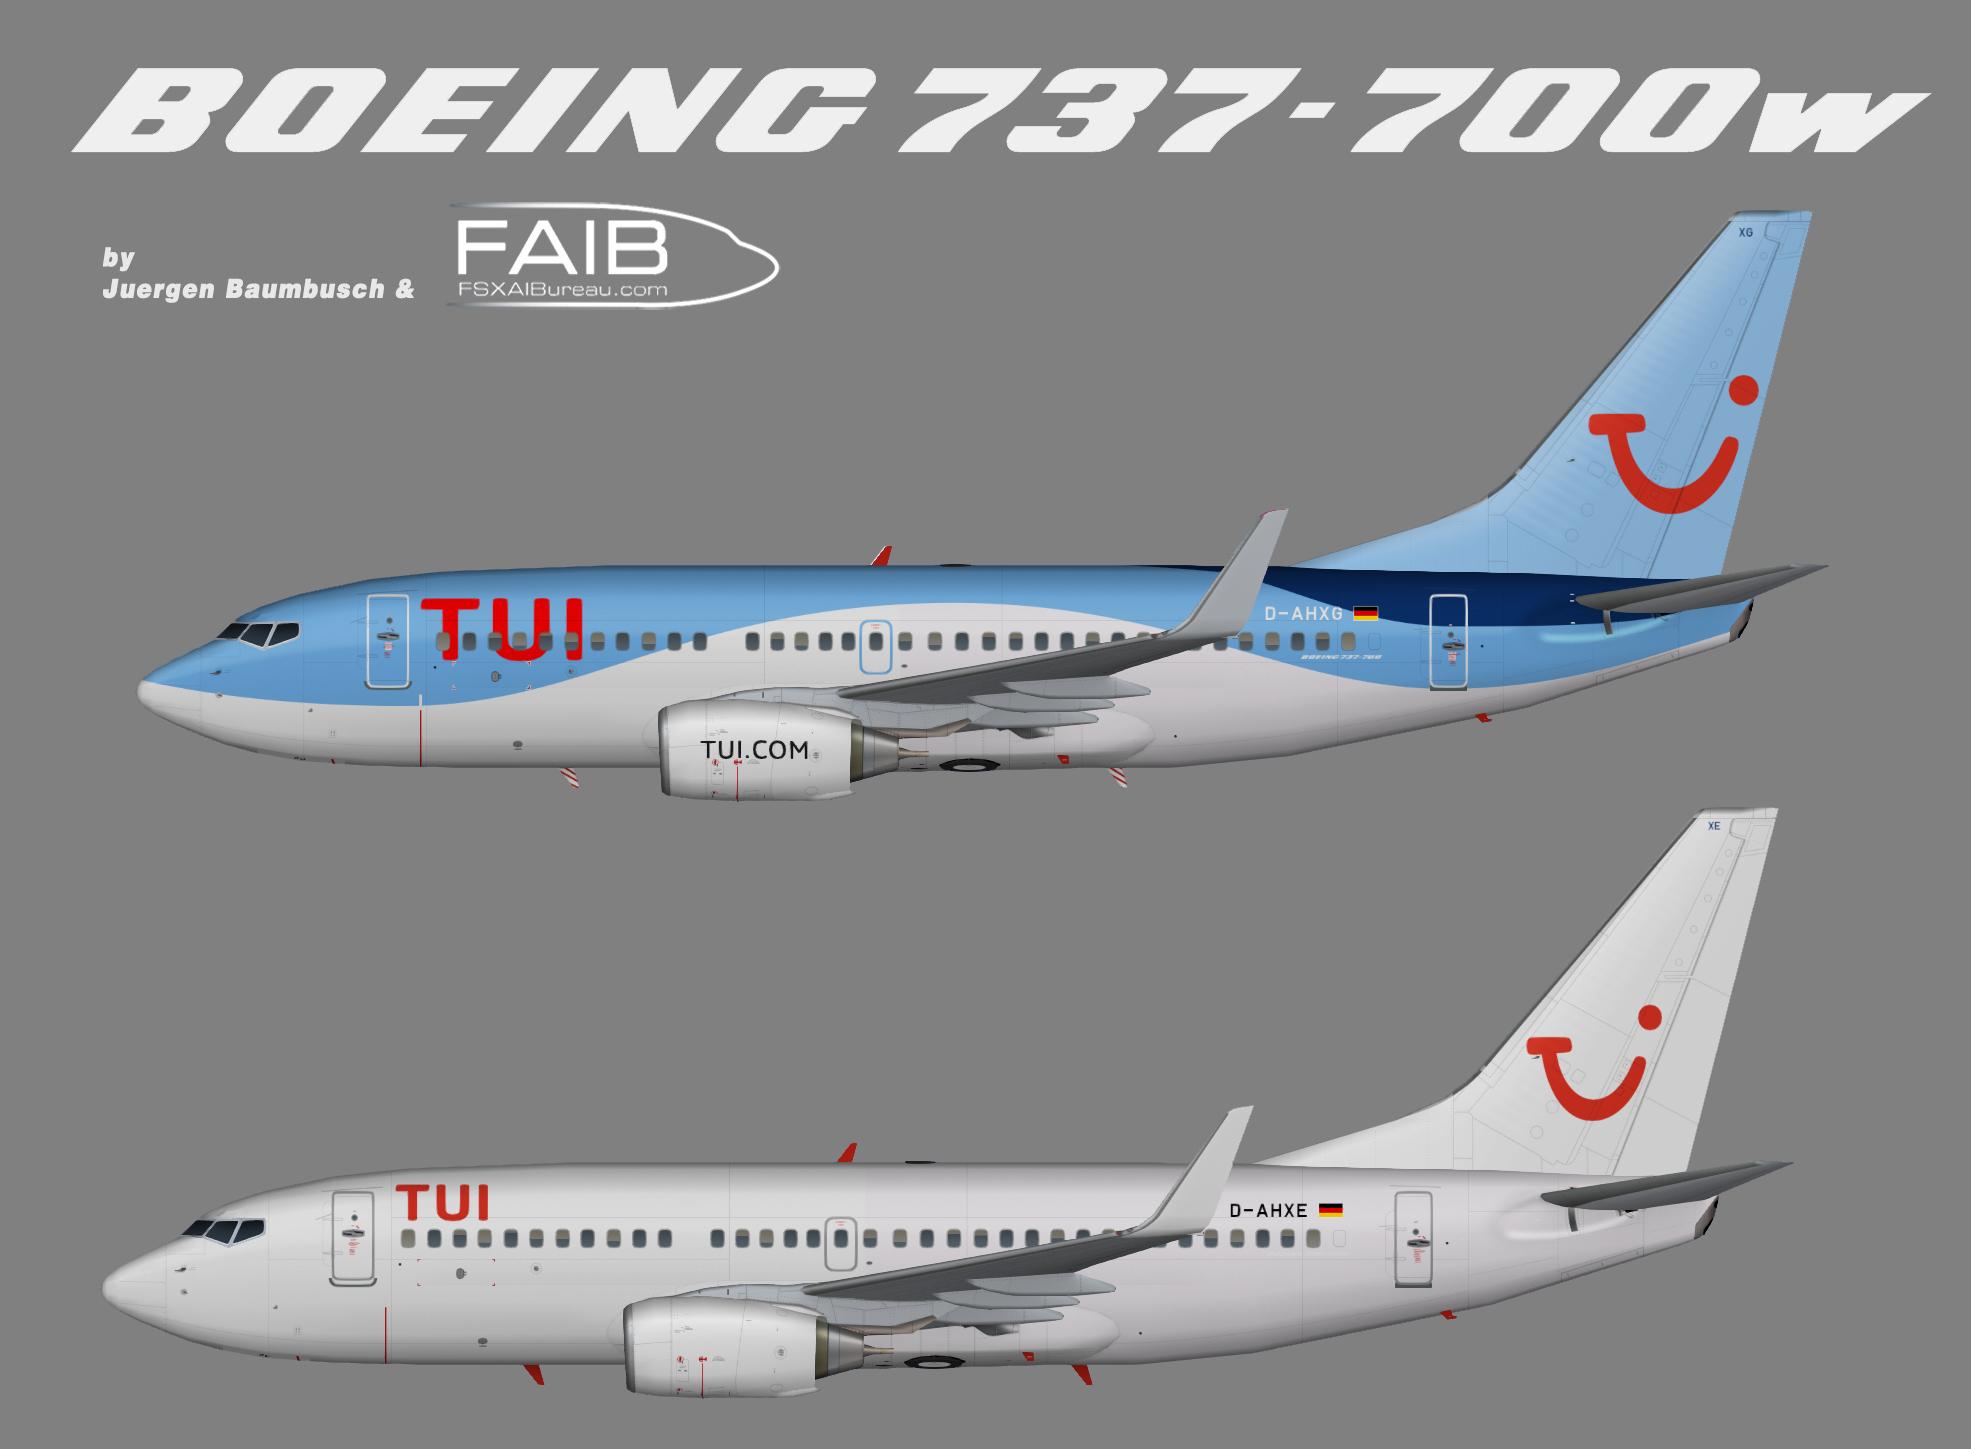 Tuifly Boeing 737-700w NC revised